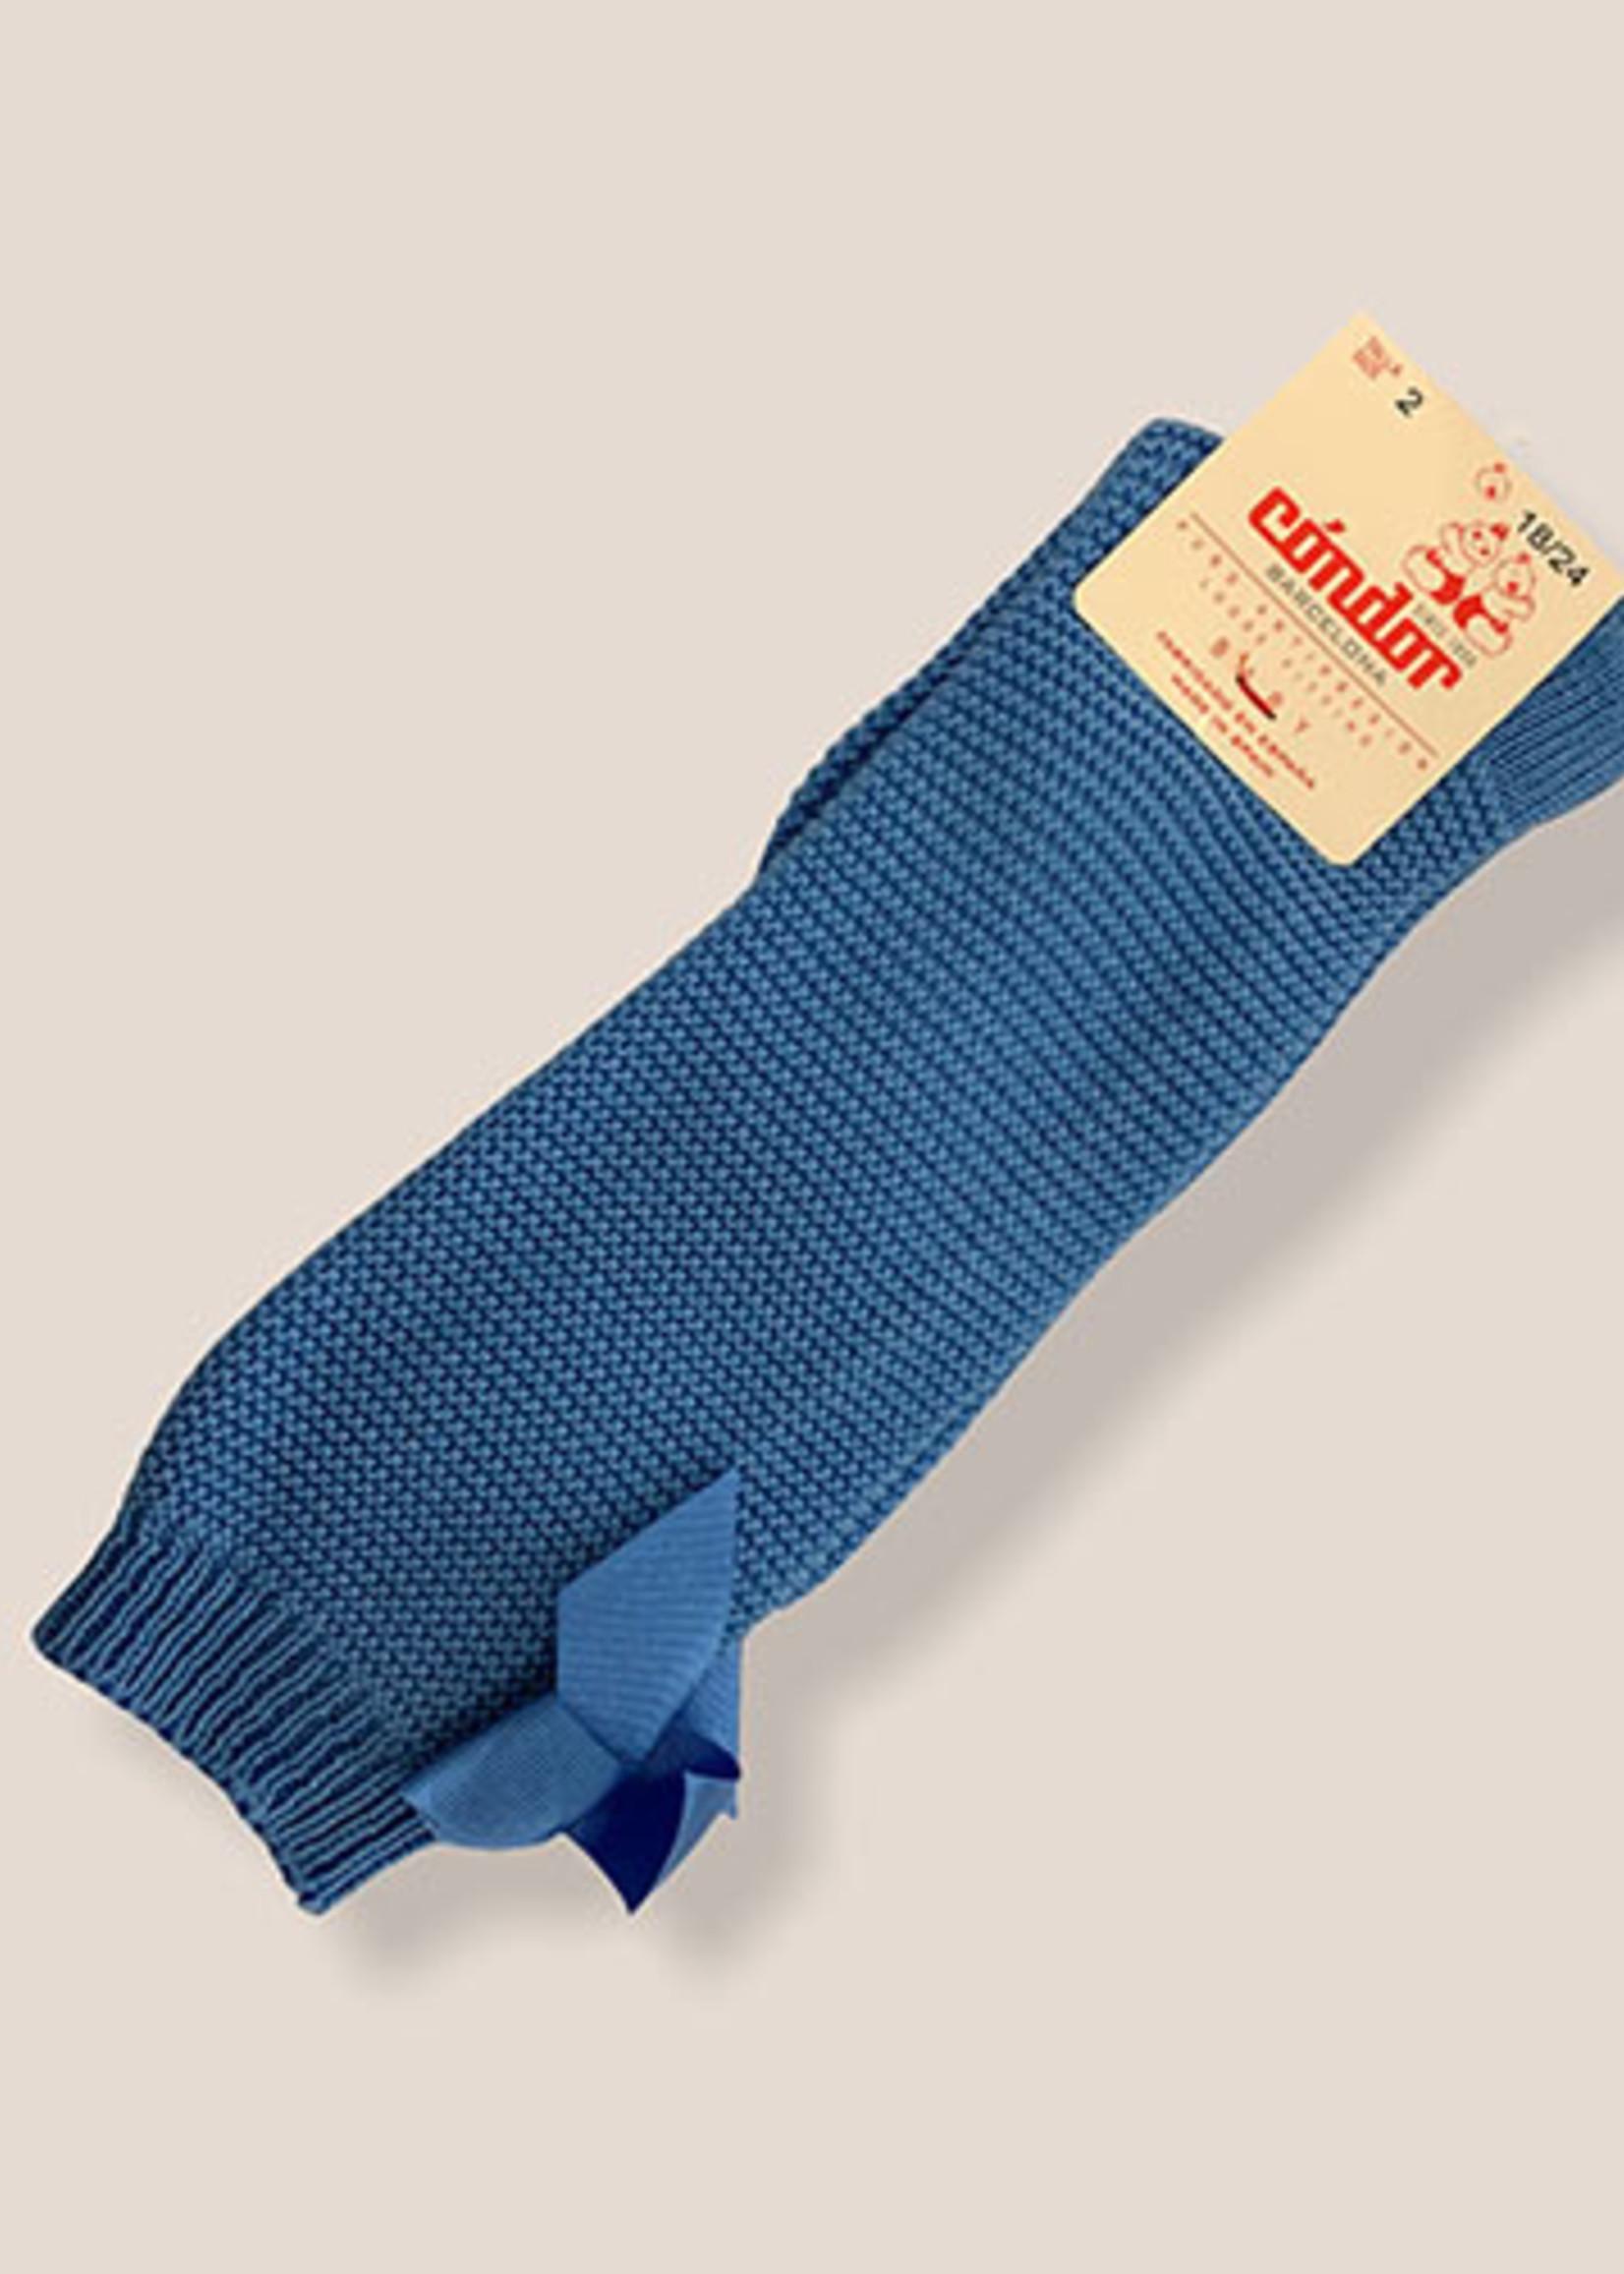 condor Condor-ss21 2.007 garter stitch knee high socks with bow